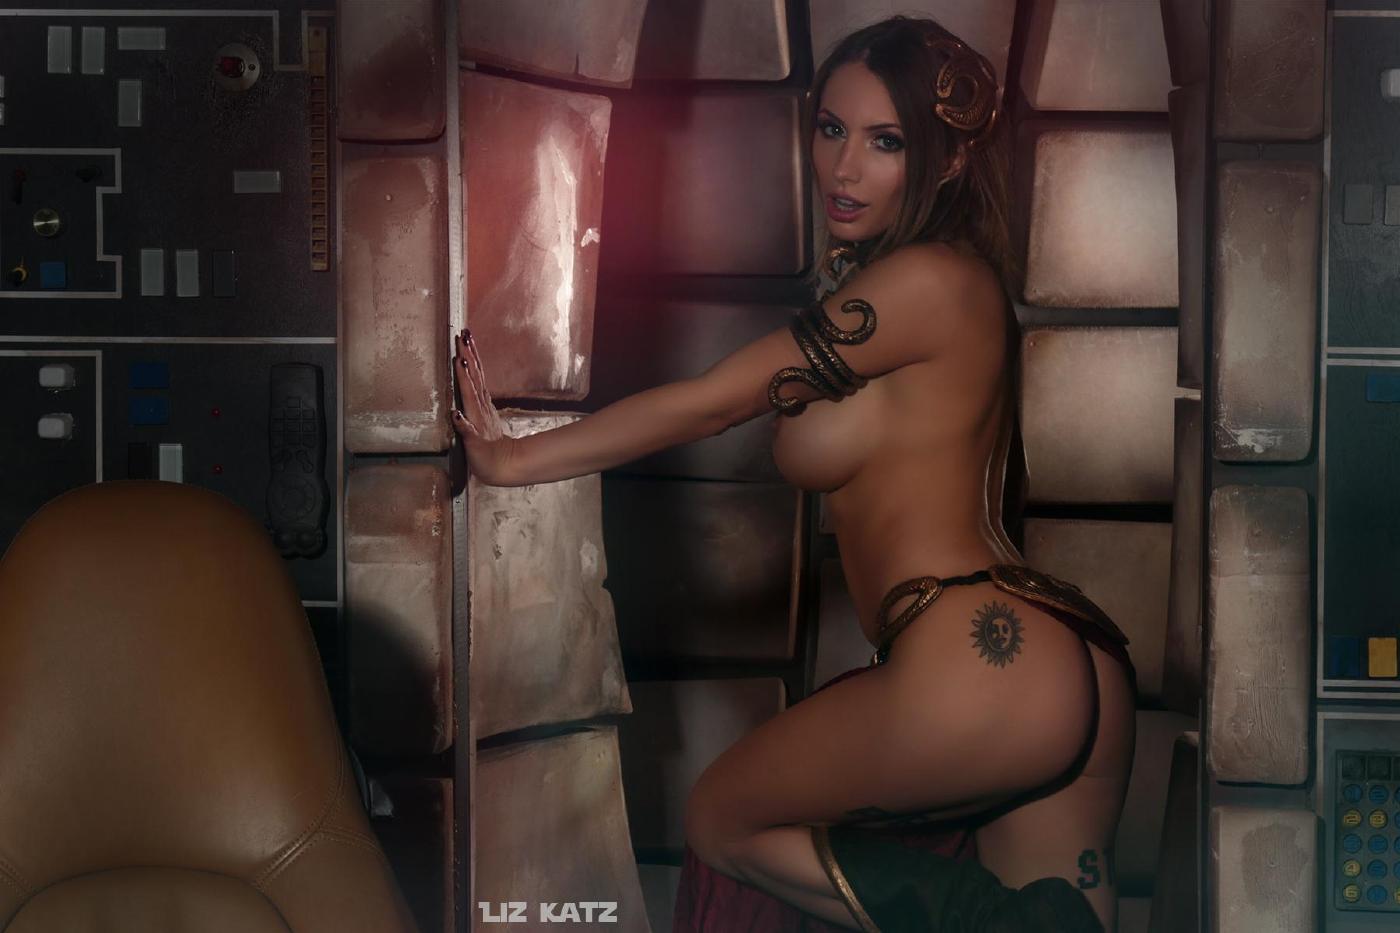 Liz Katz Slave Leia Nude Cosplay Onlyfans Leaked Photos 10